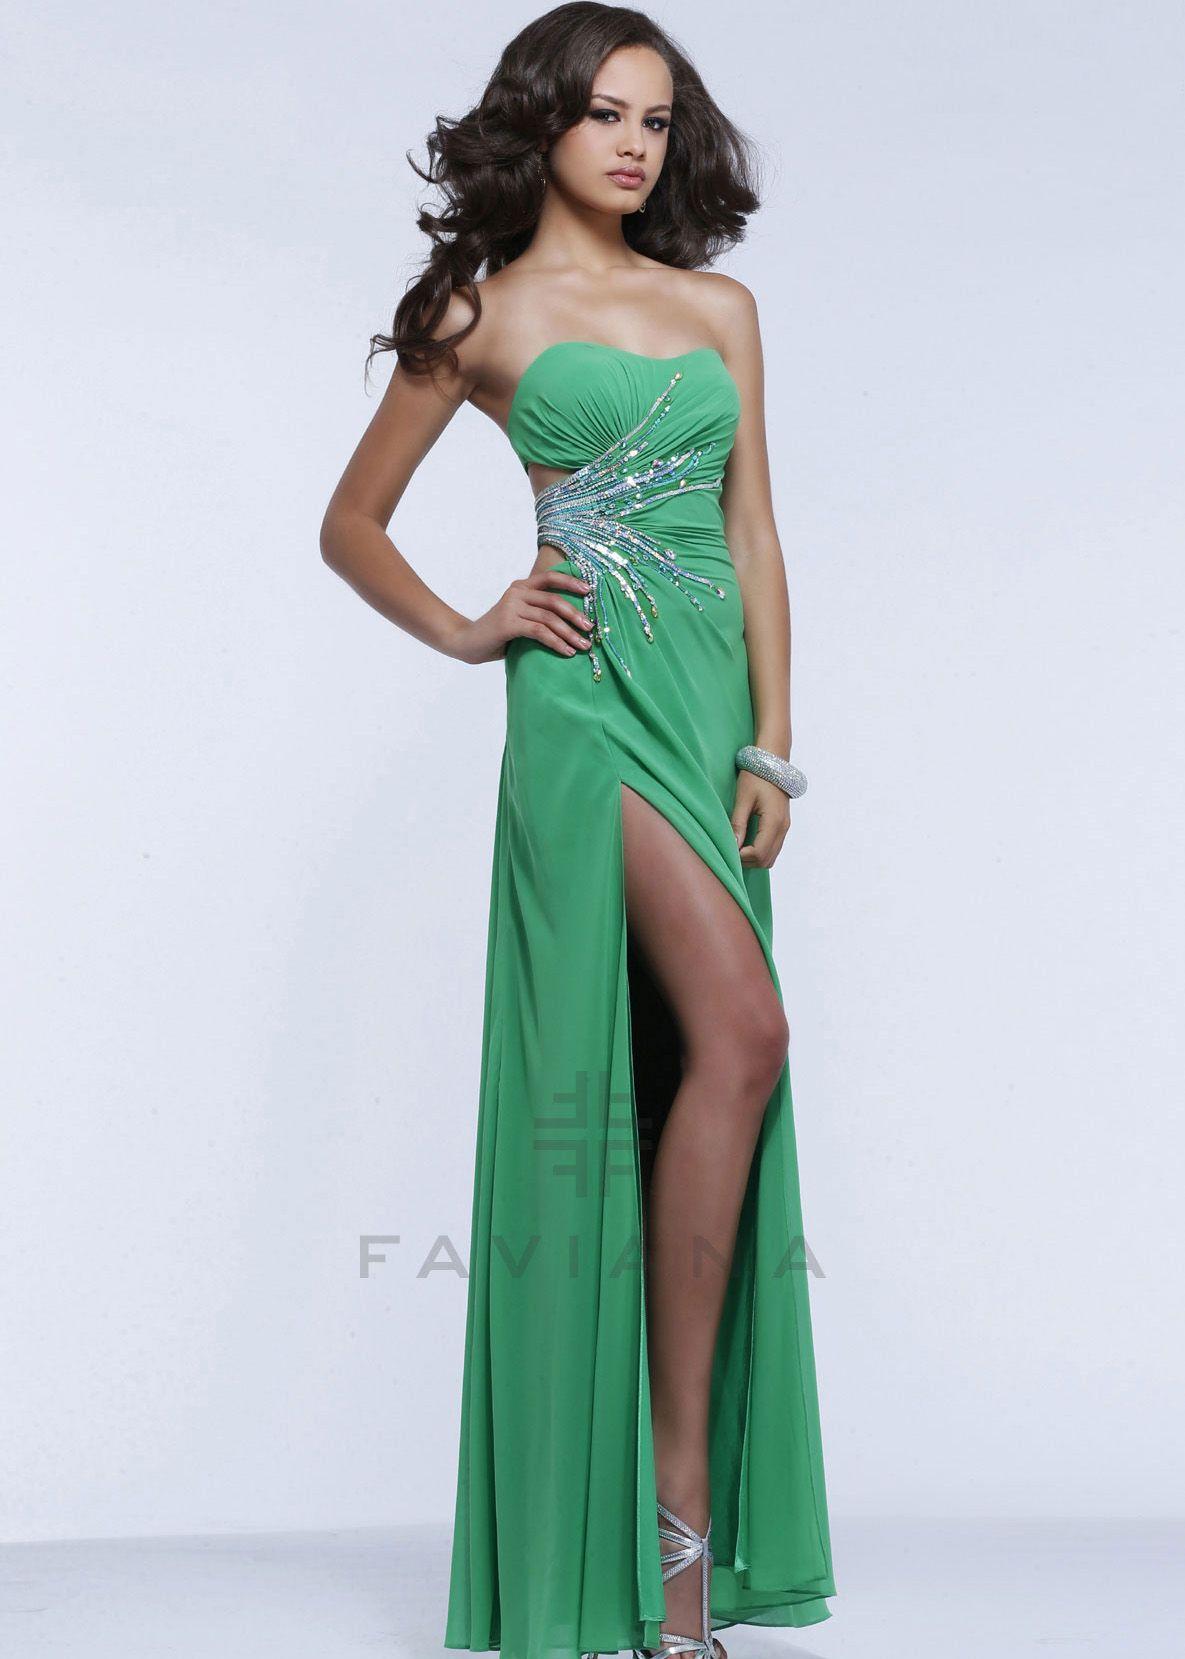 Faviana 7350 - Kelly Green Strapless Chiffon Prom Dresses Online ...